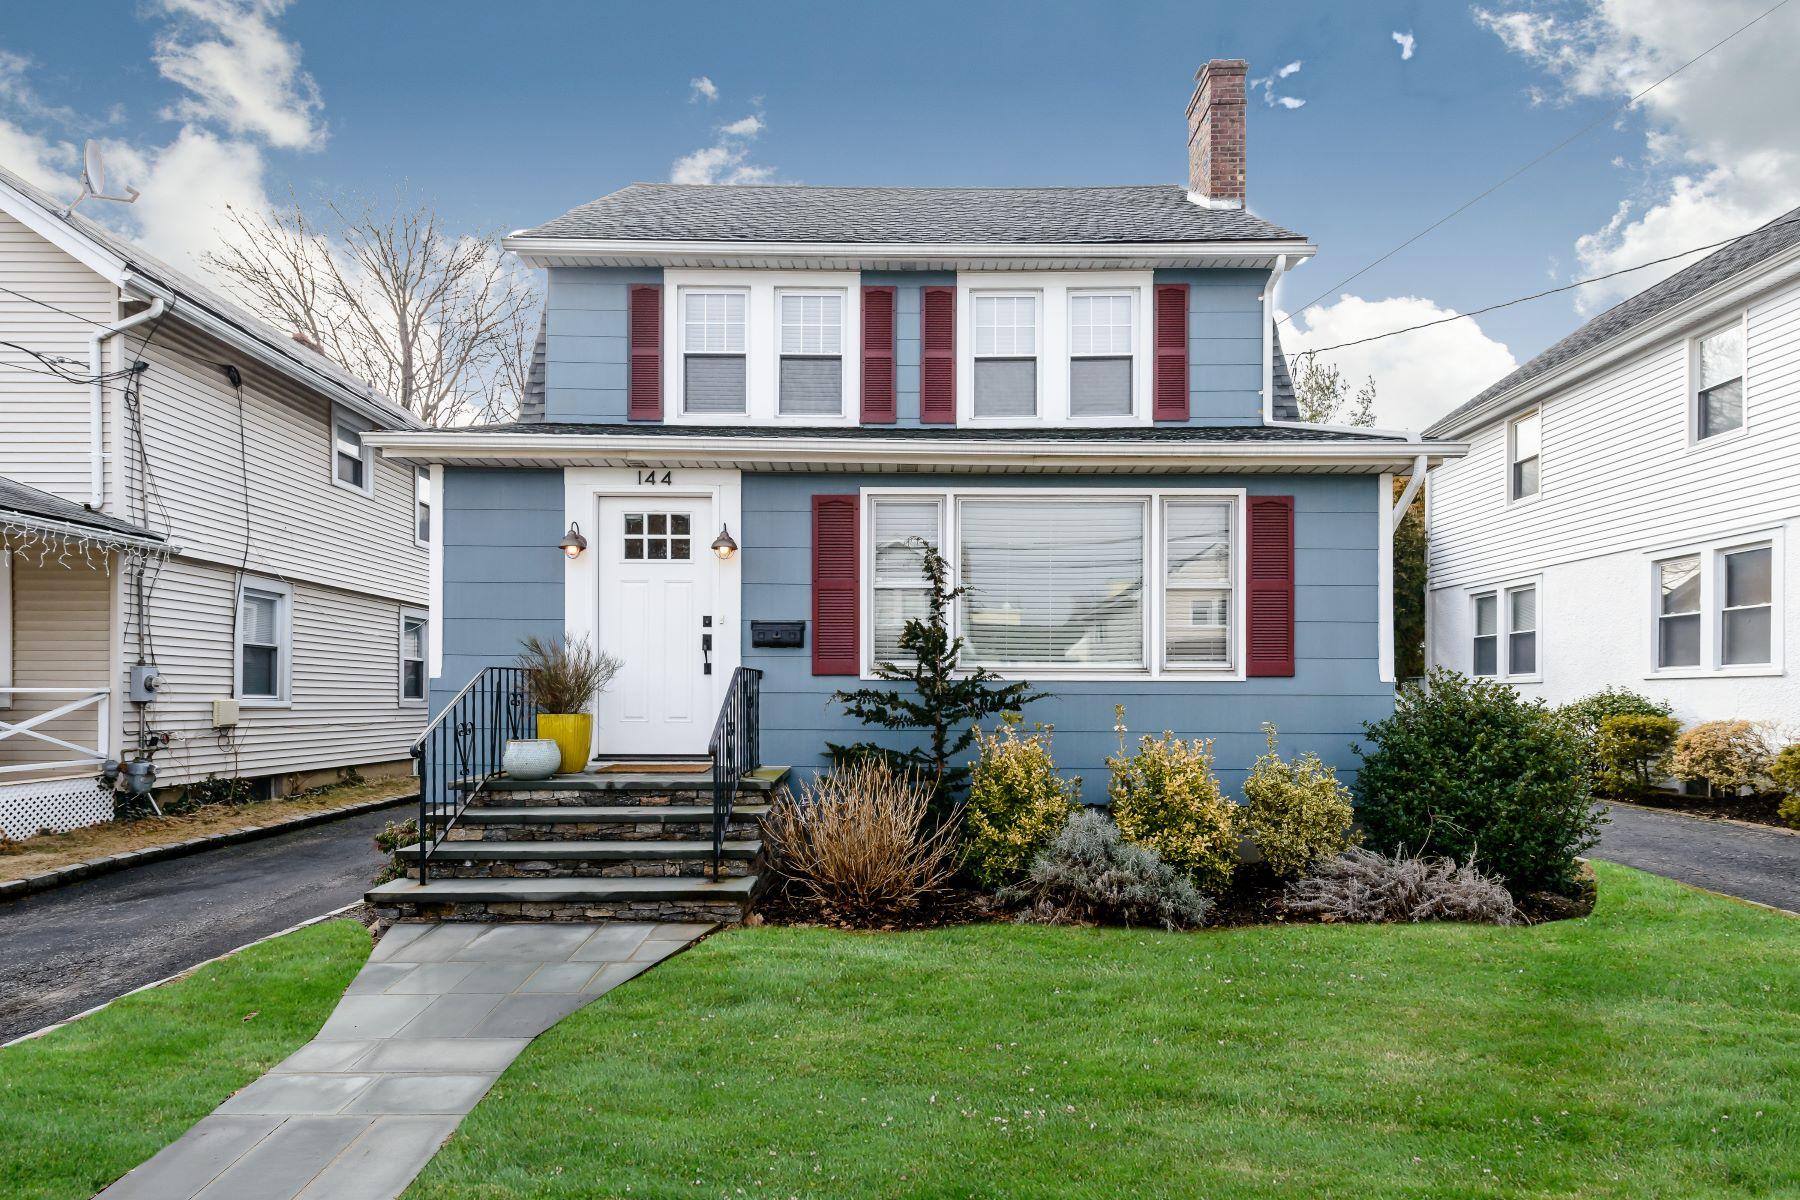 独户住宅 为 销售 在 144 Bayview Ave , Port Washington, NY 11050 144 Bayview Ave, 华盛顿港, 纽约州, 11050 美国